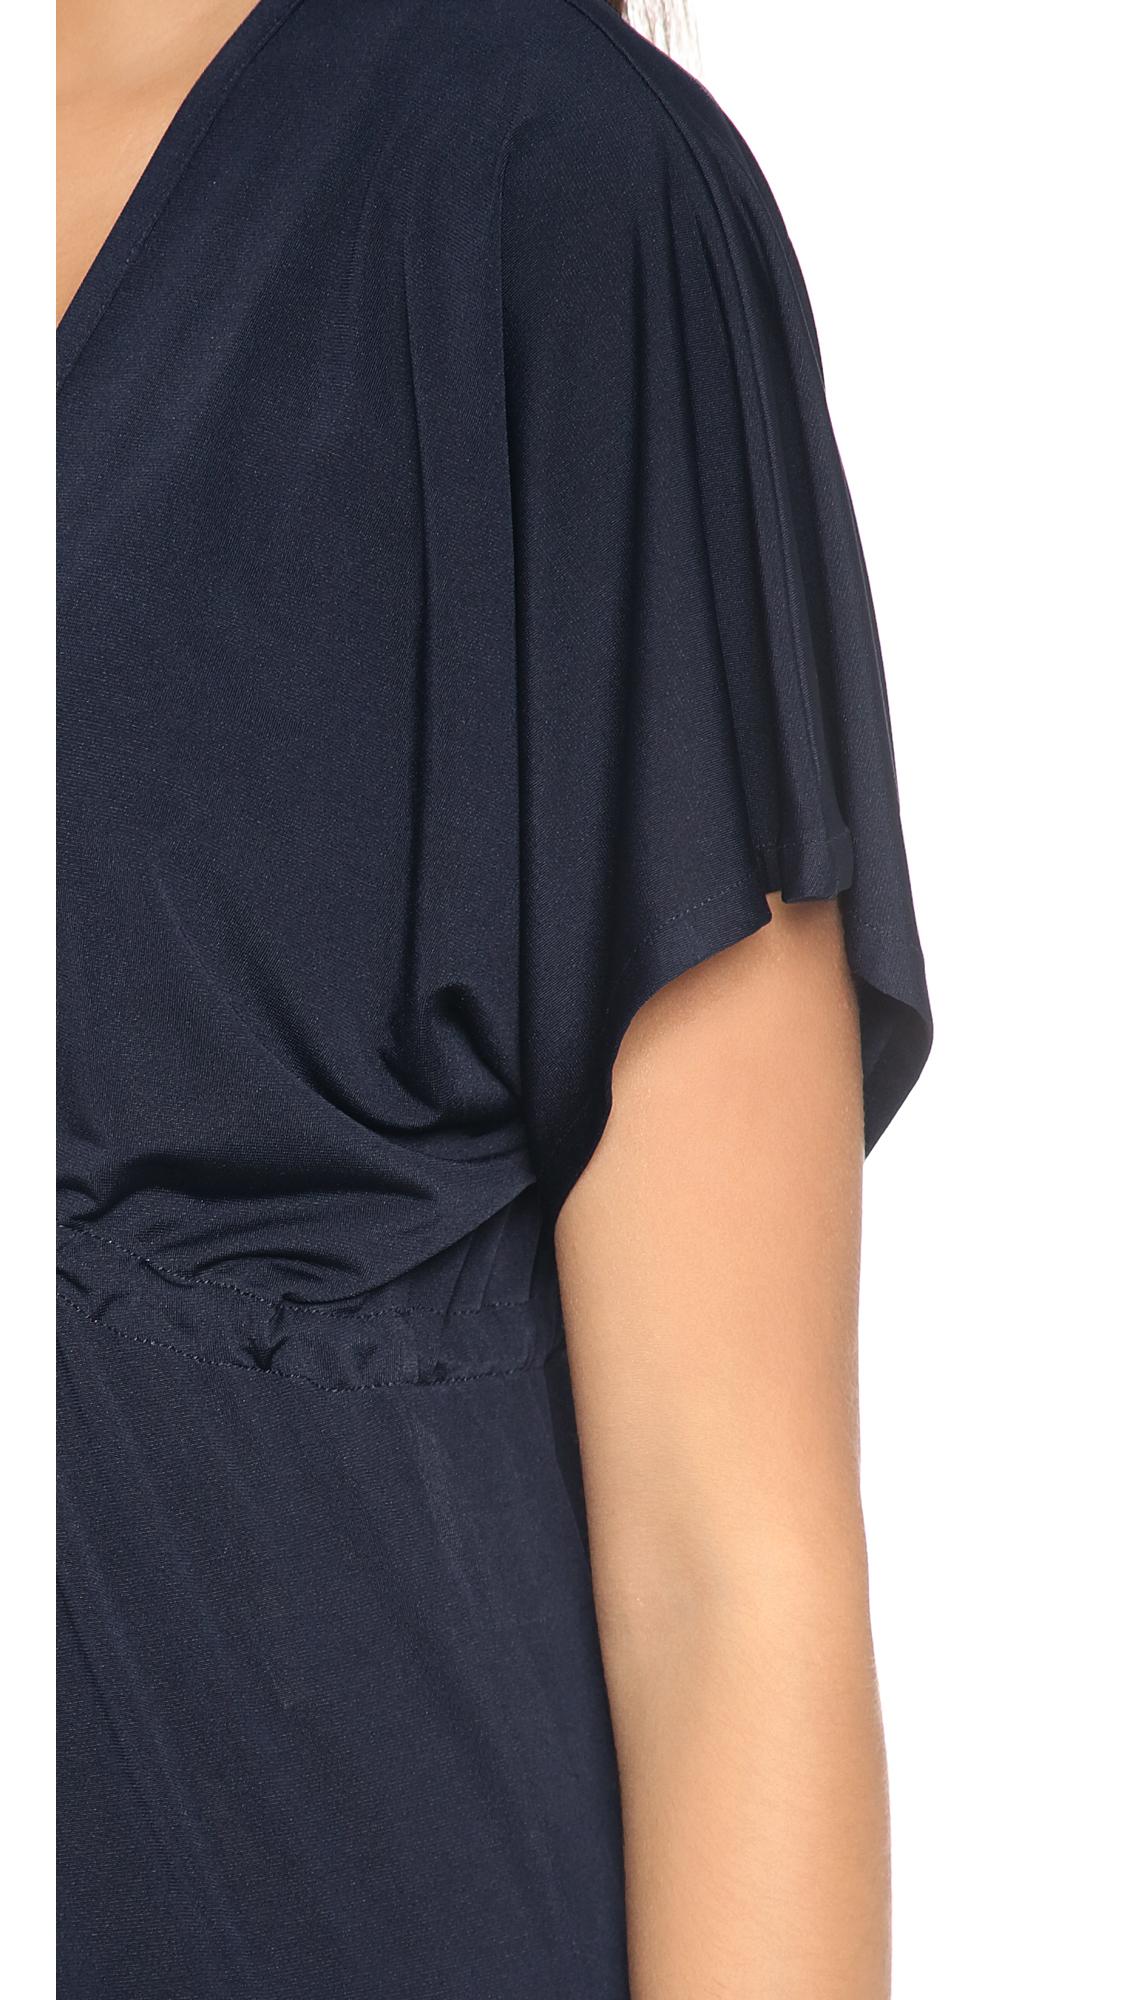 Lyst Josa Tulum Rustic Cover Up Dress Black In Blue